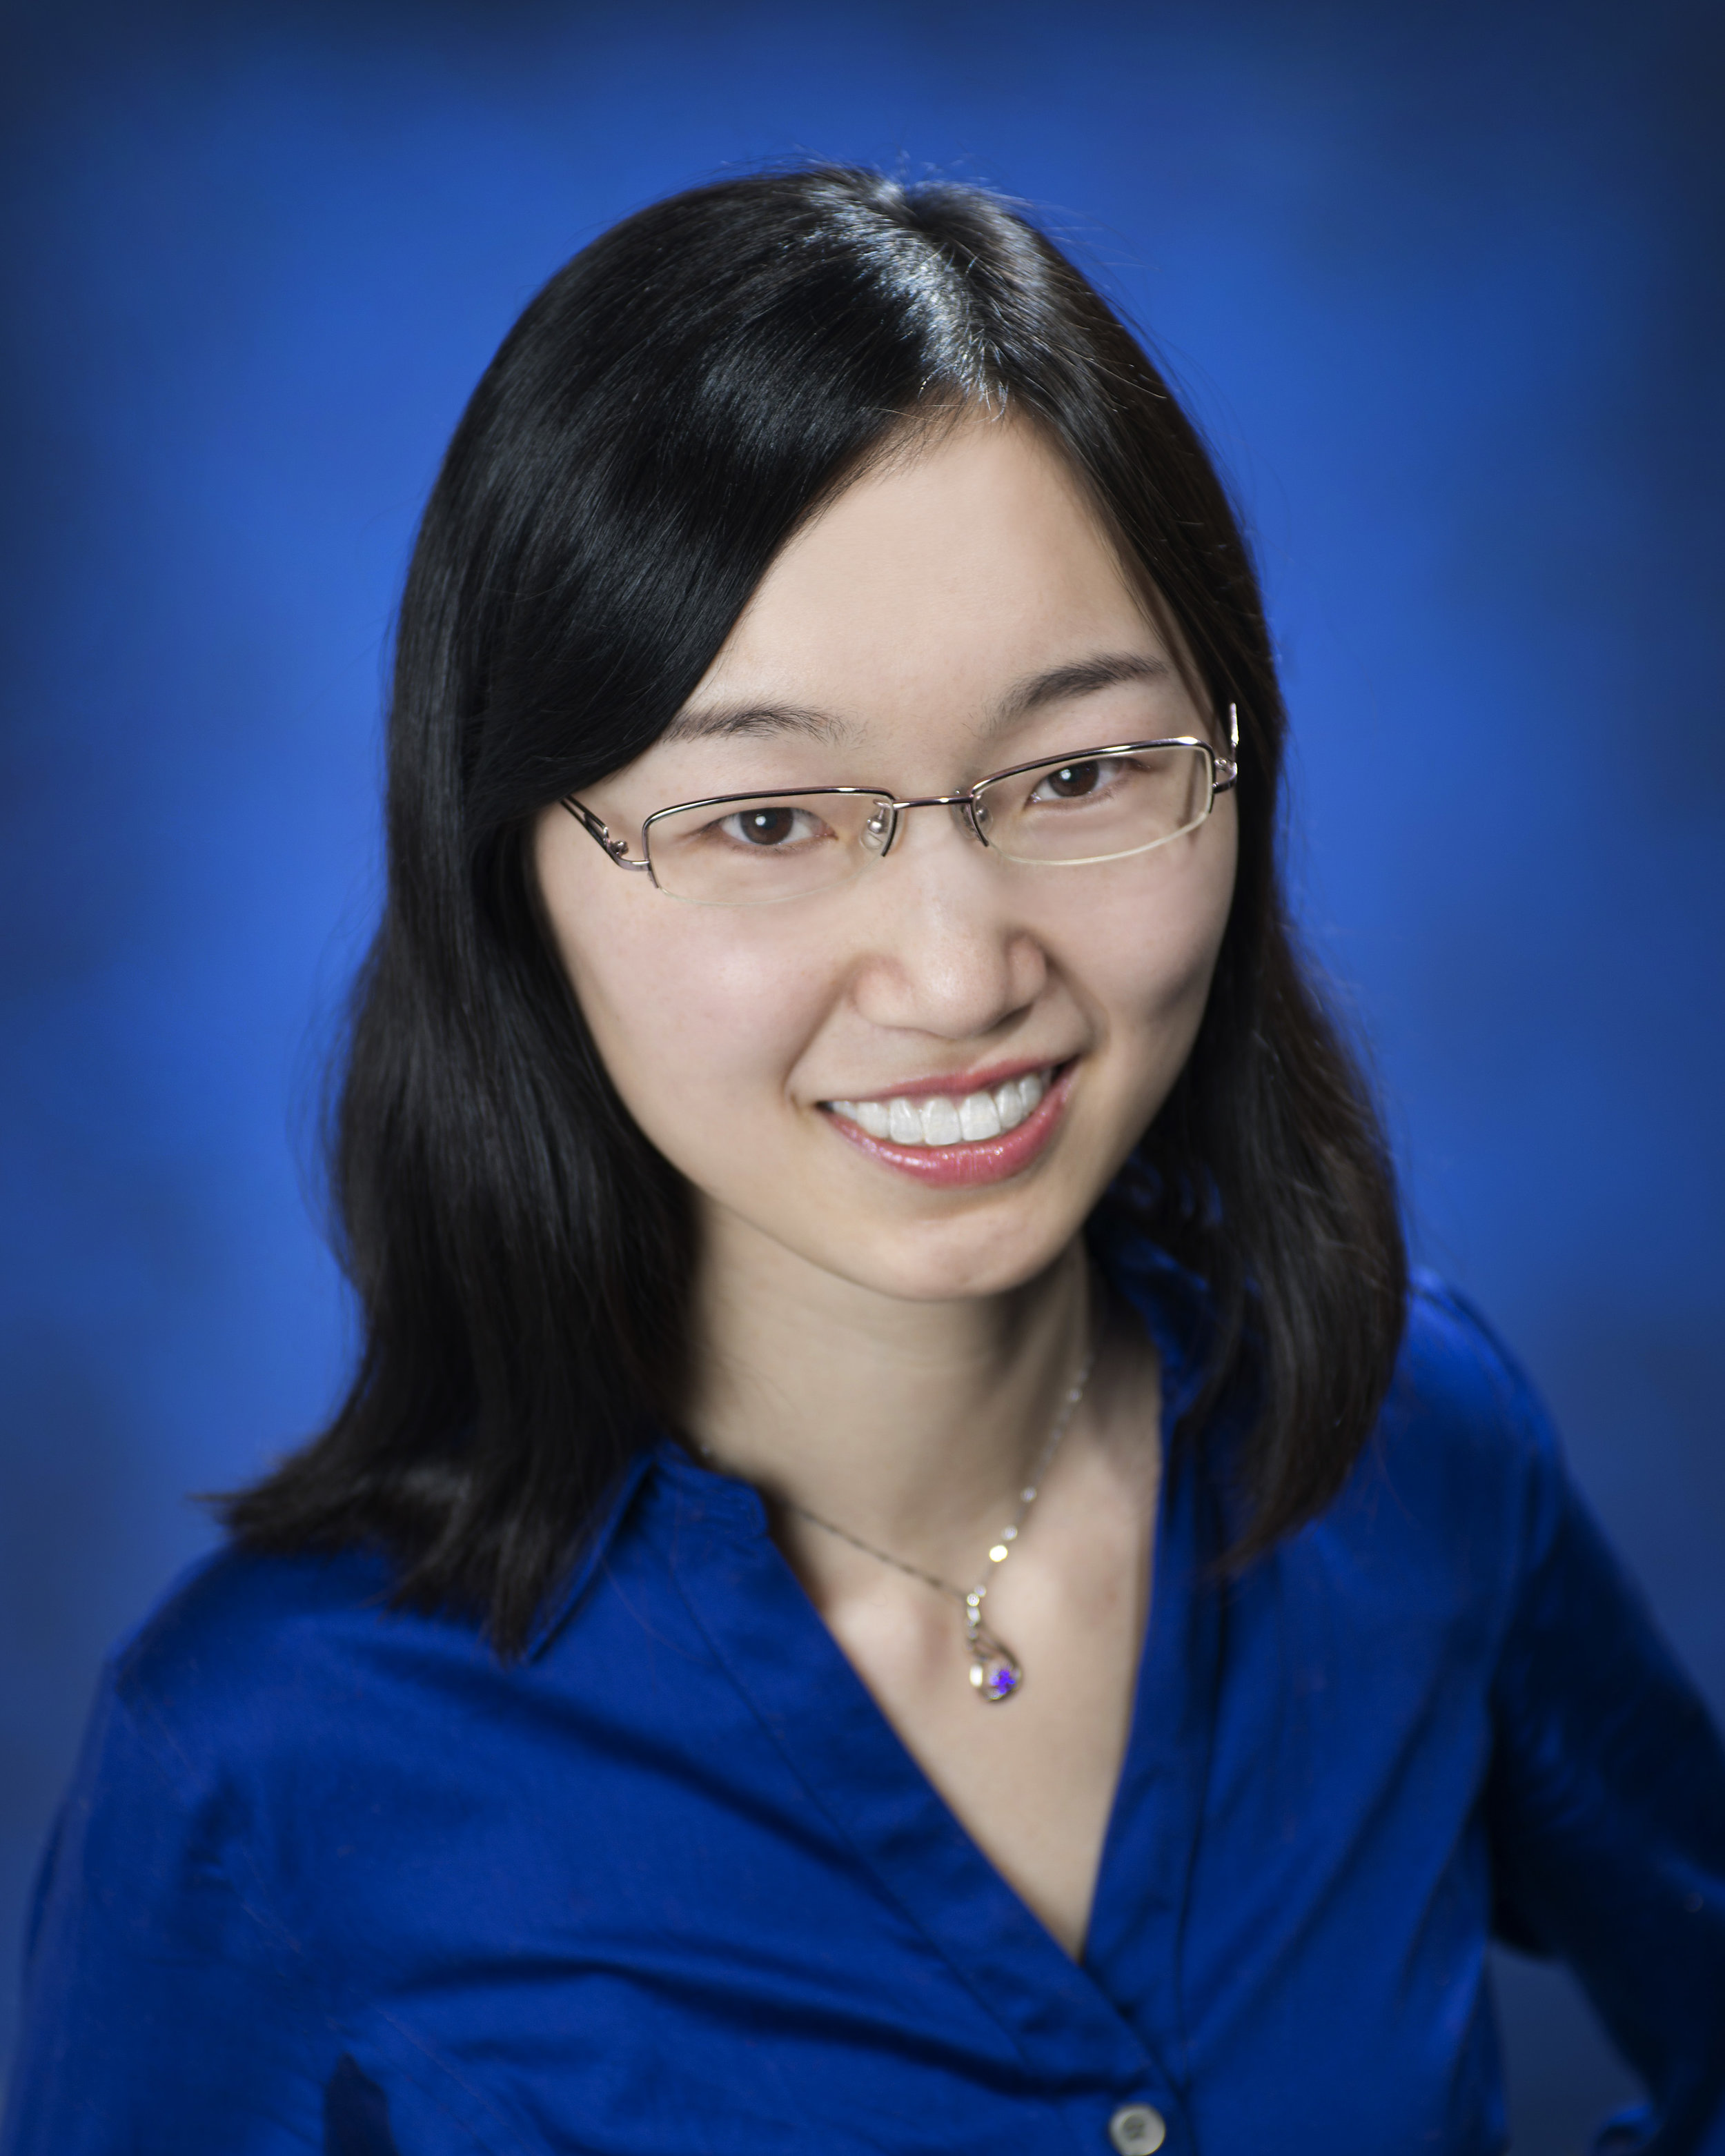 Fang Xu - Postdoctoral Fellow at Harvard University at Cynthia Friend's Lab.